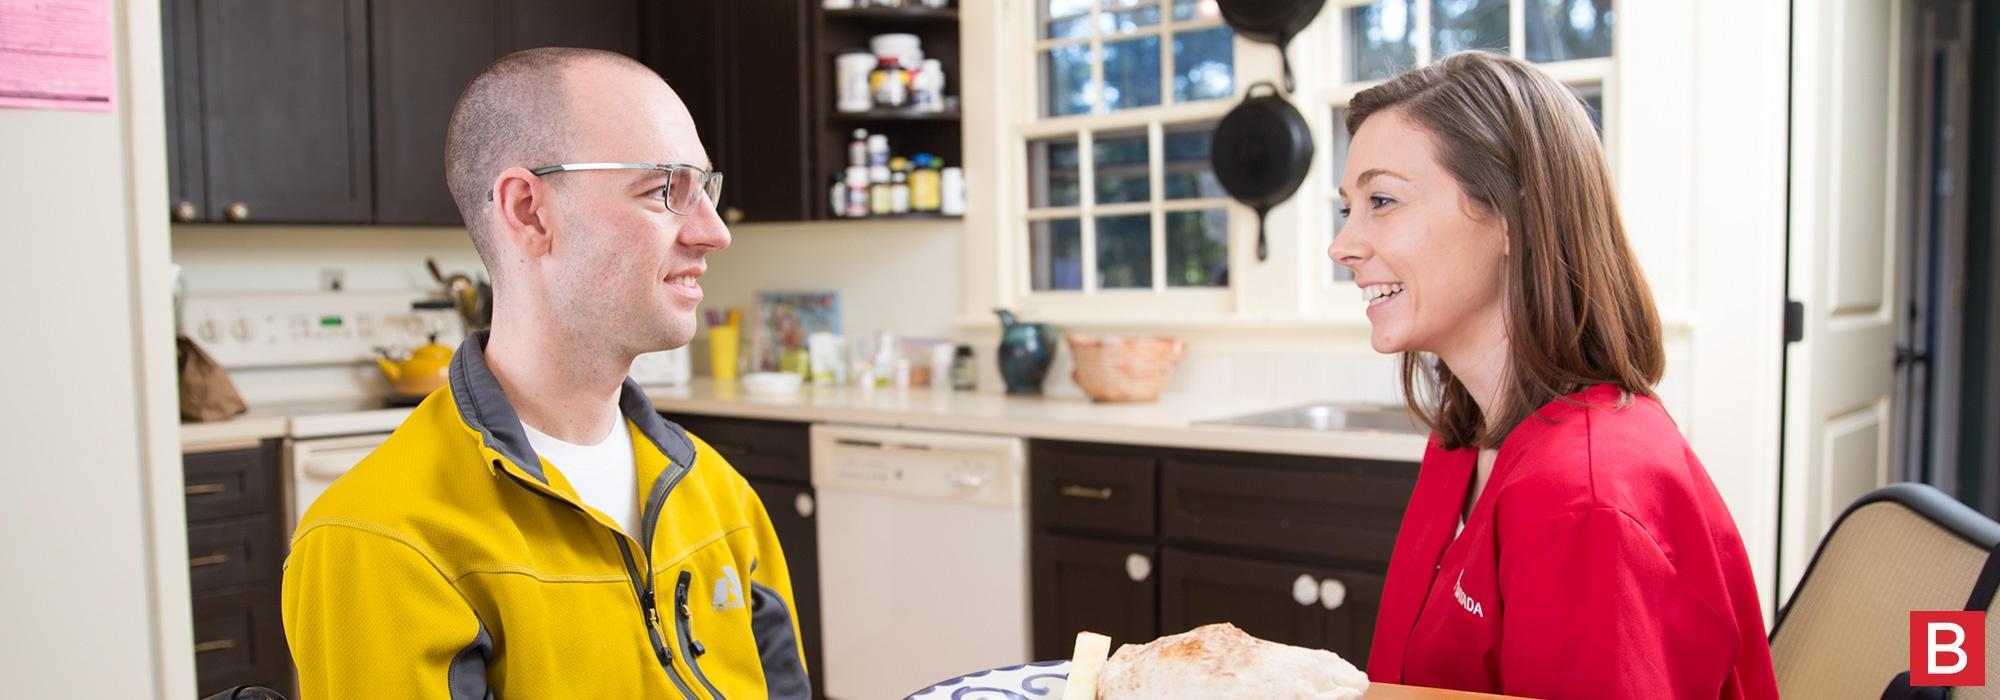 Home-care-assistance-ALS-2000x700.jpg